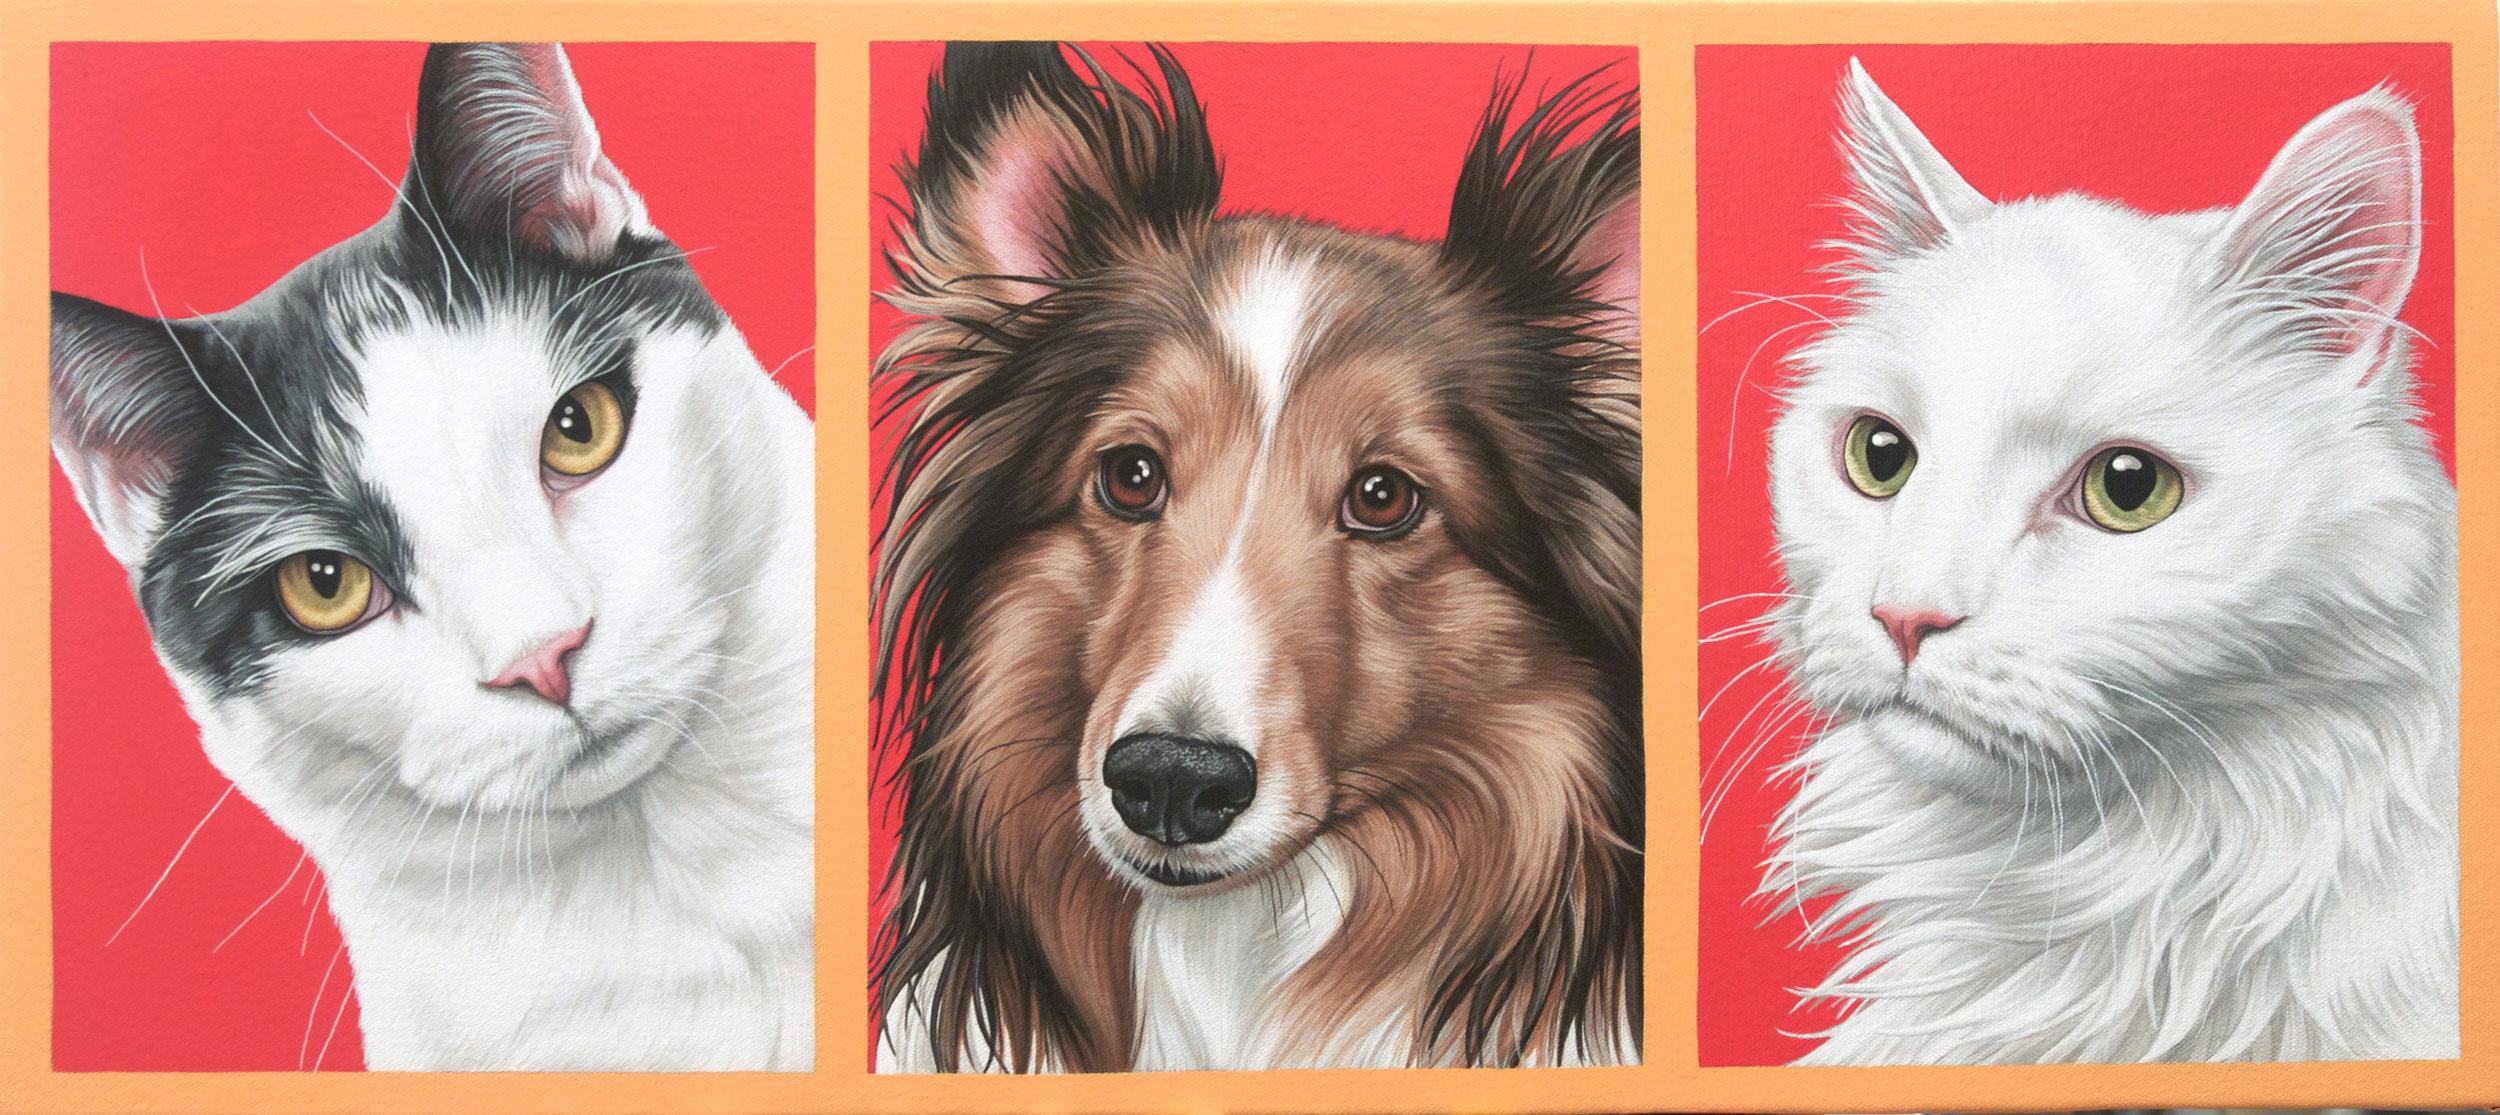 """Tryp, Chepi + Gaby"", latex enamel on canvas, 12"" x 27"", 2016"